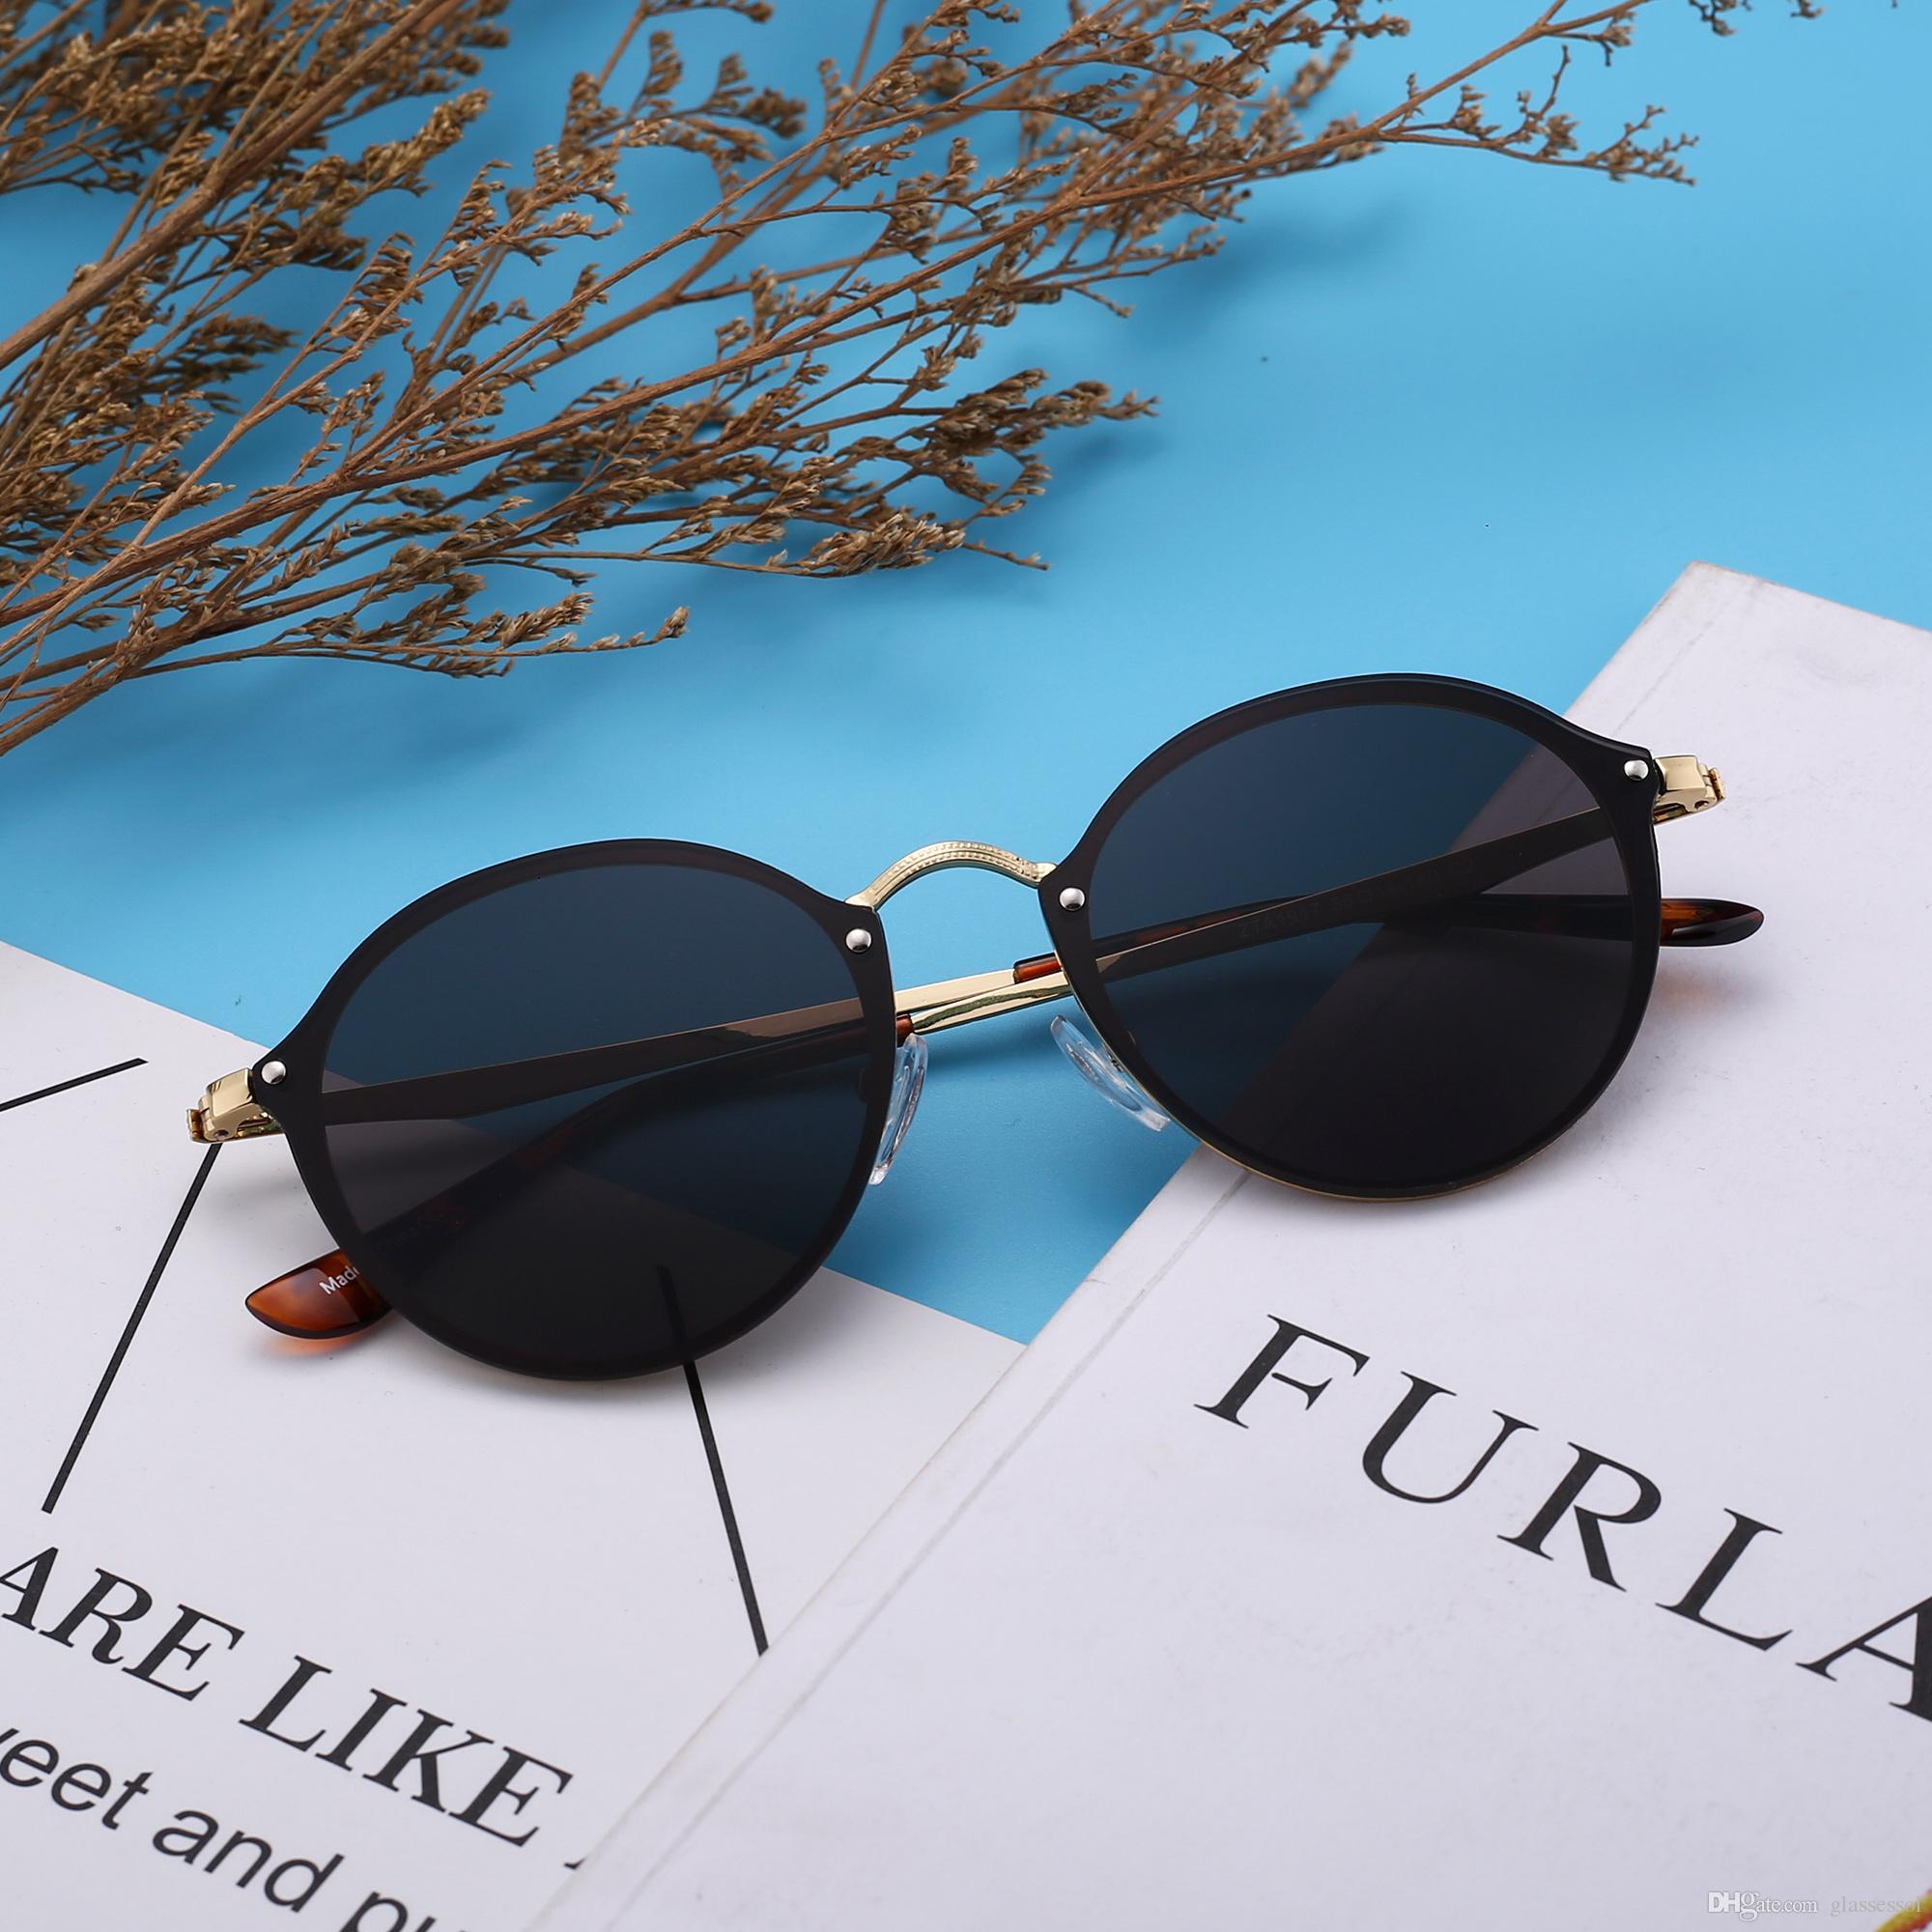 a1f796be571 Polarized Sunglasses Women Sunglasses Carfia 5288 Oval Designer ...